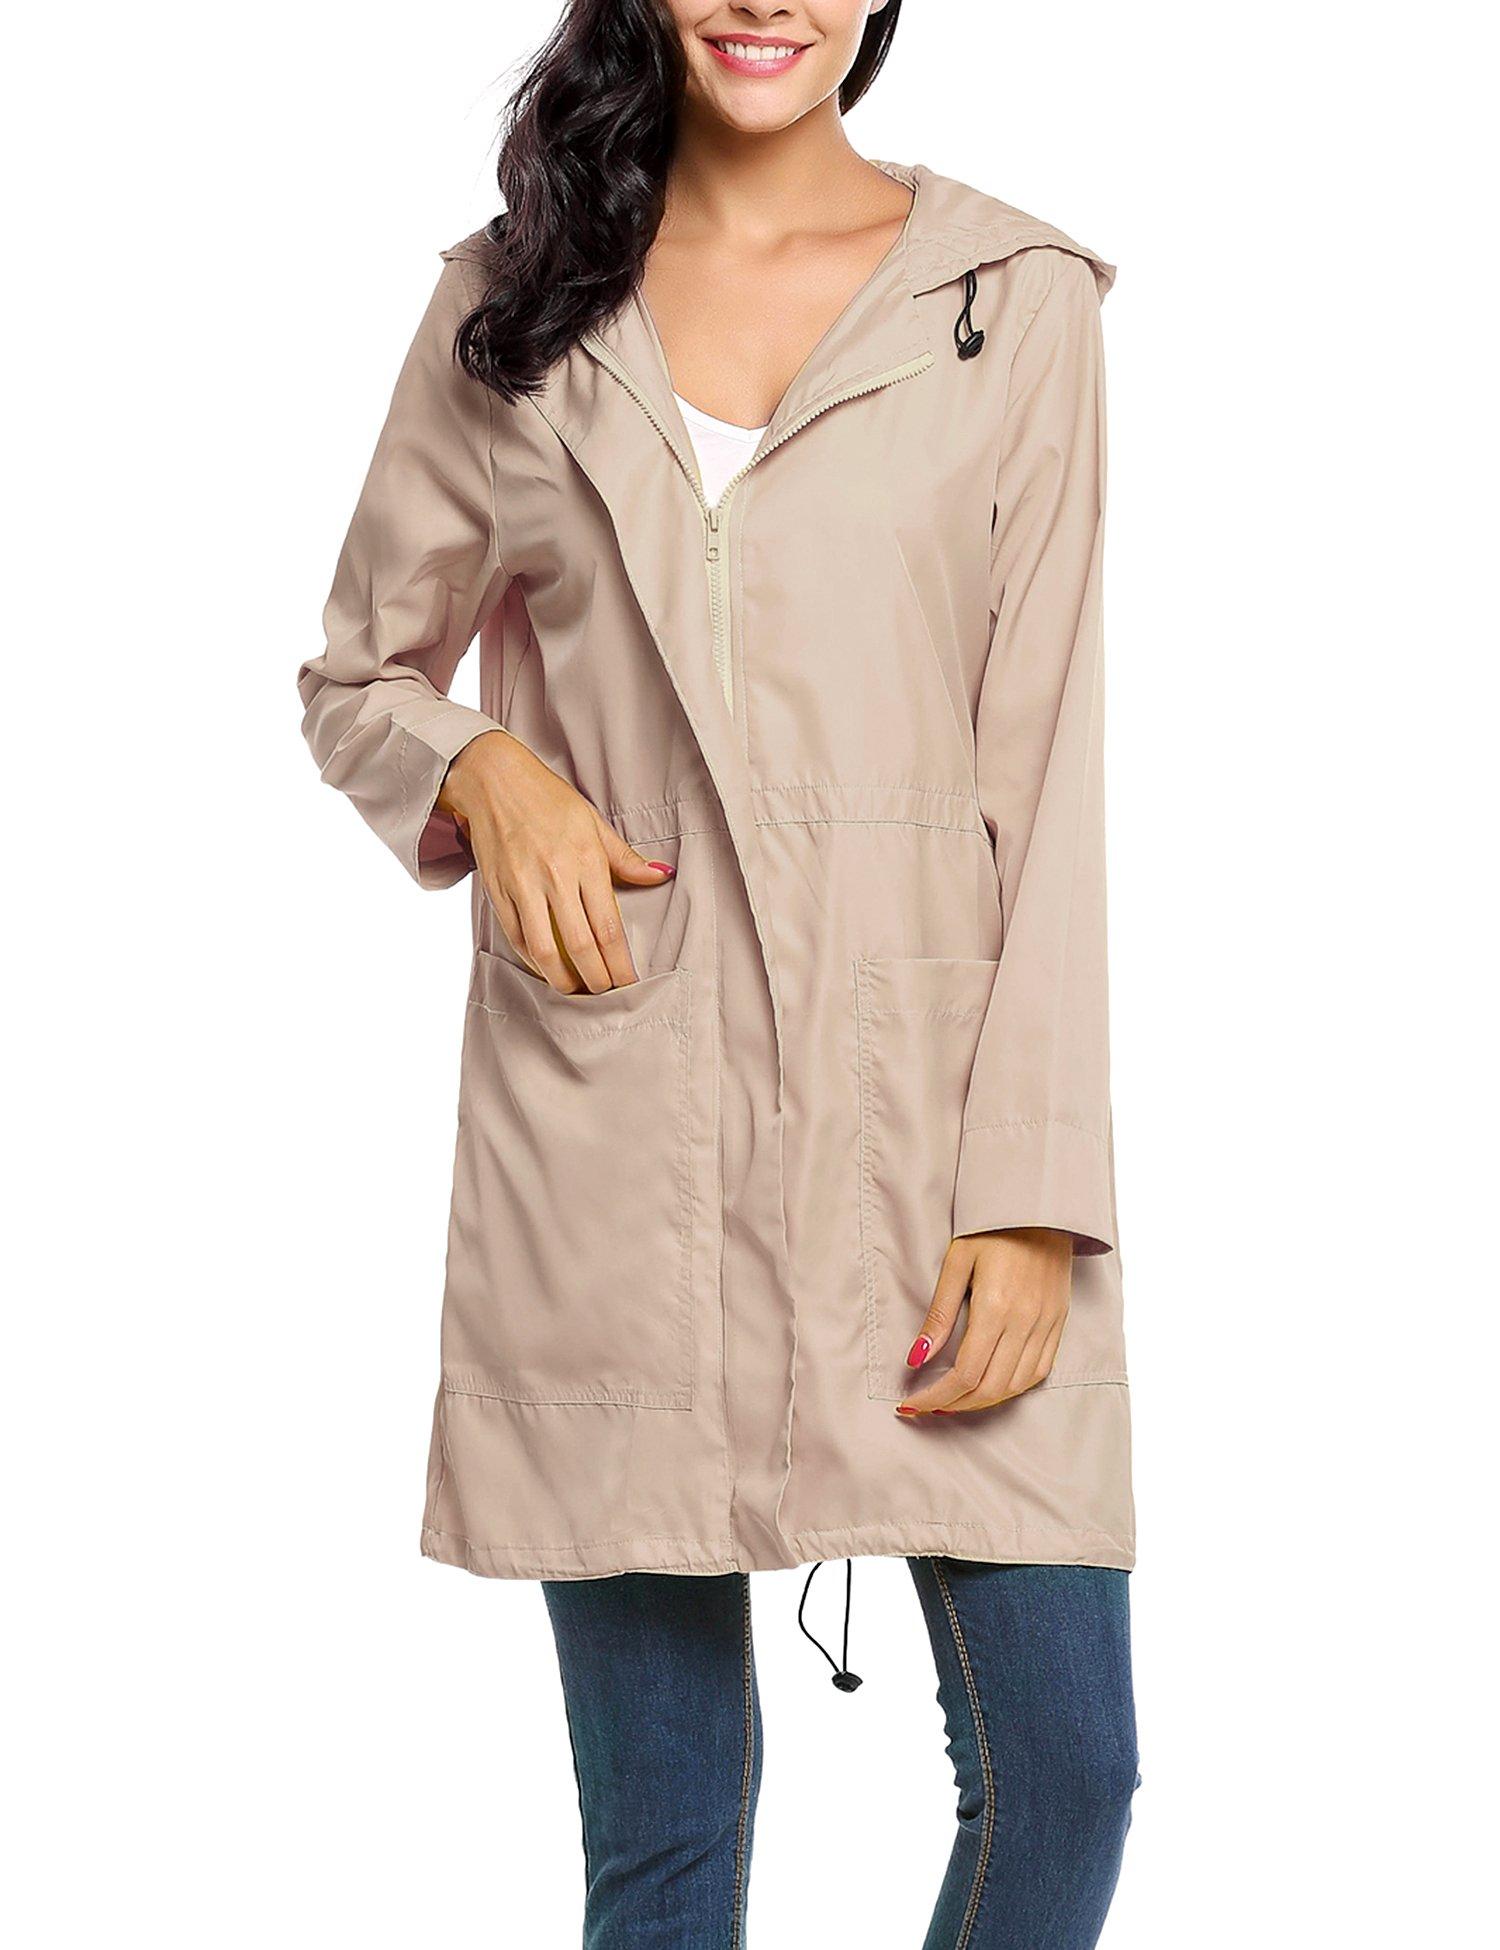 Avernon Fashionable Outdoor Lightweight Zipper Rain Coat for Women (Khaki, XXL)